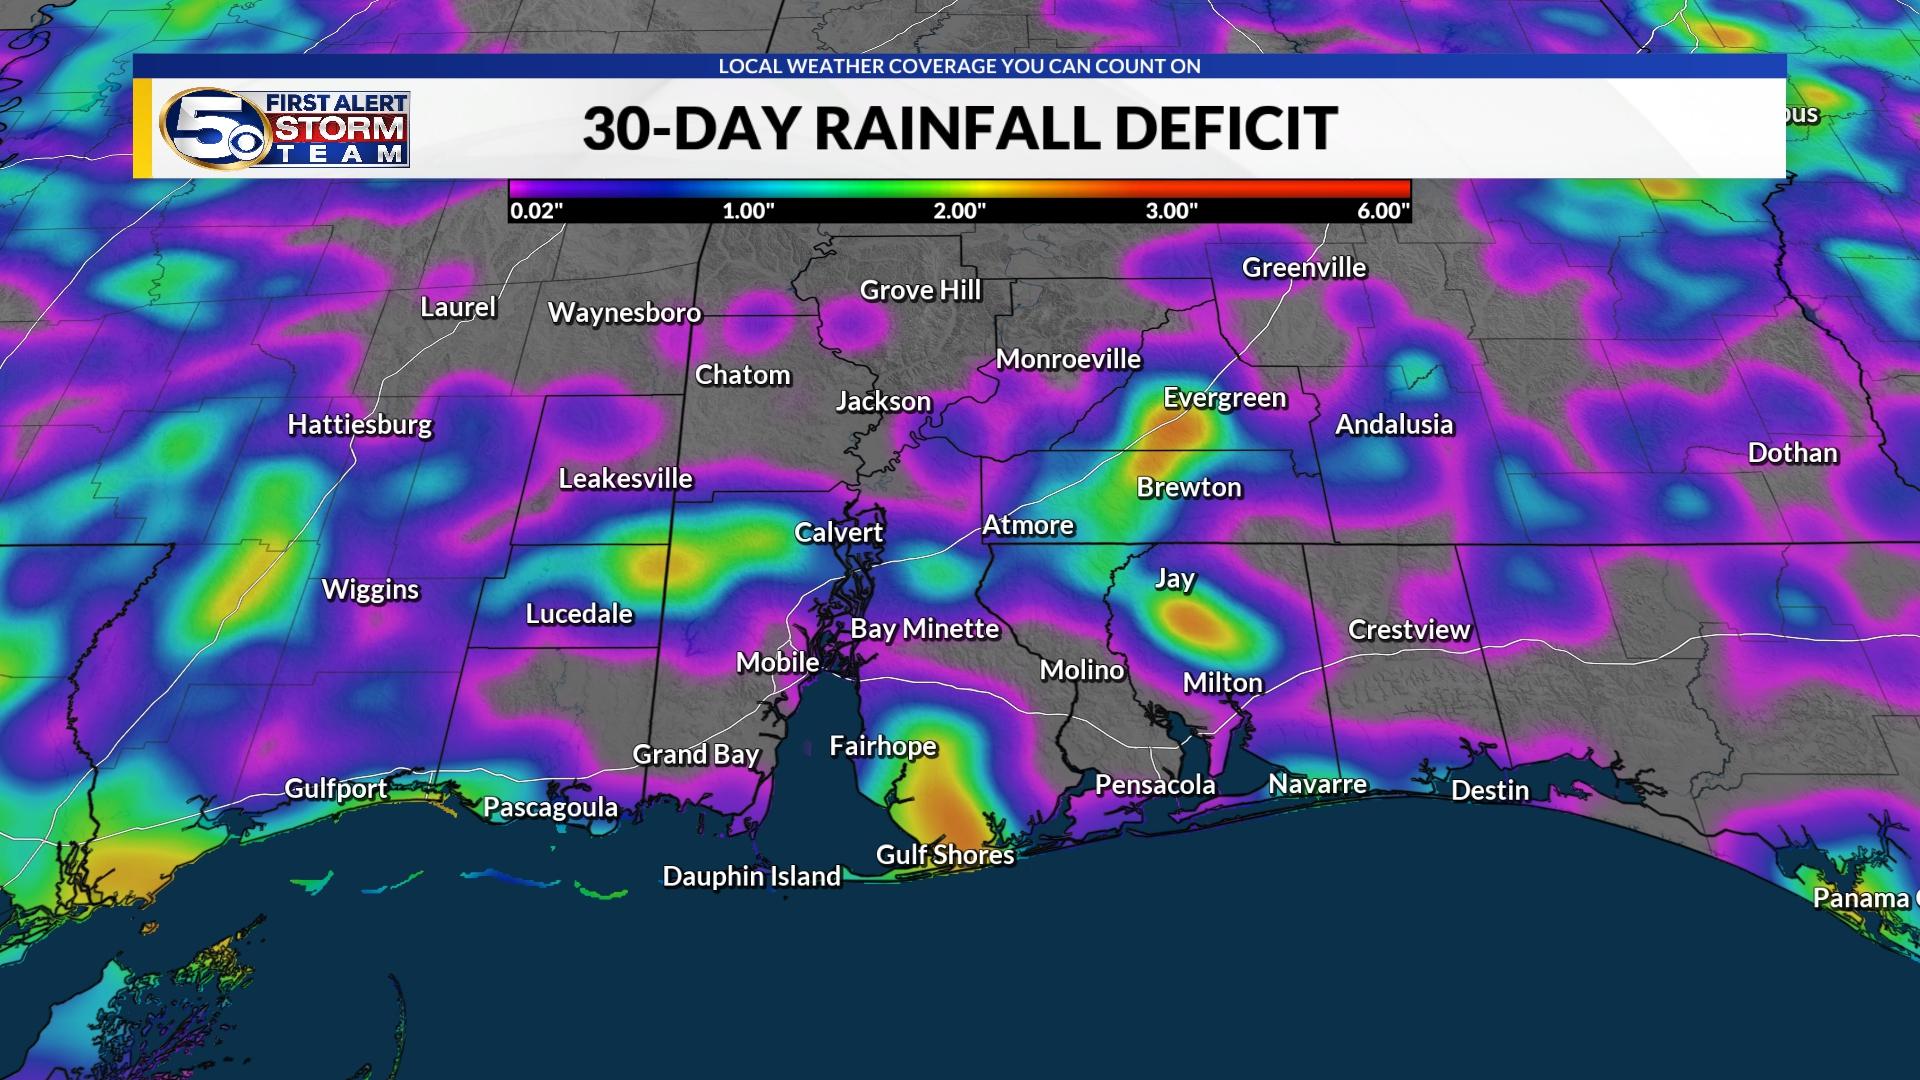 30-Day Rainfall Deficit